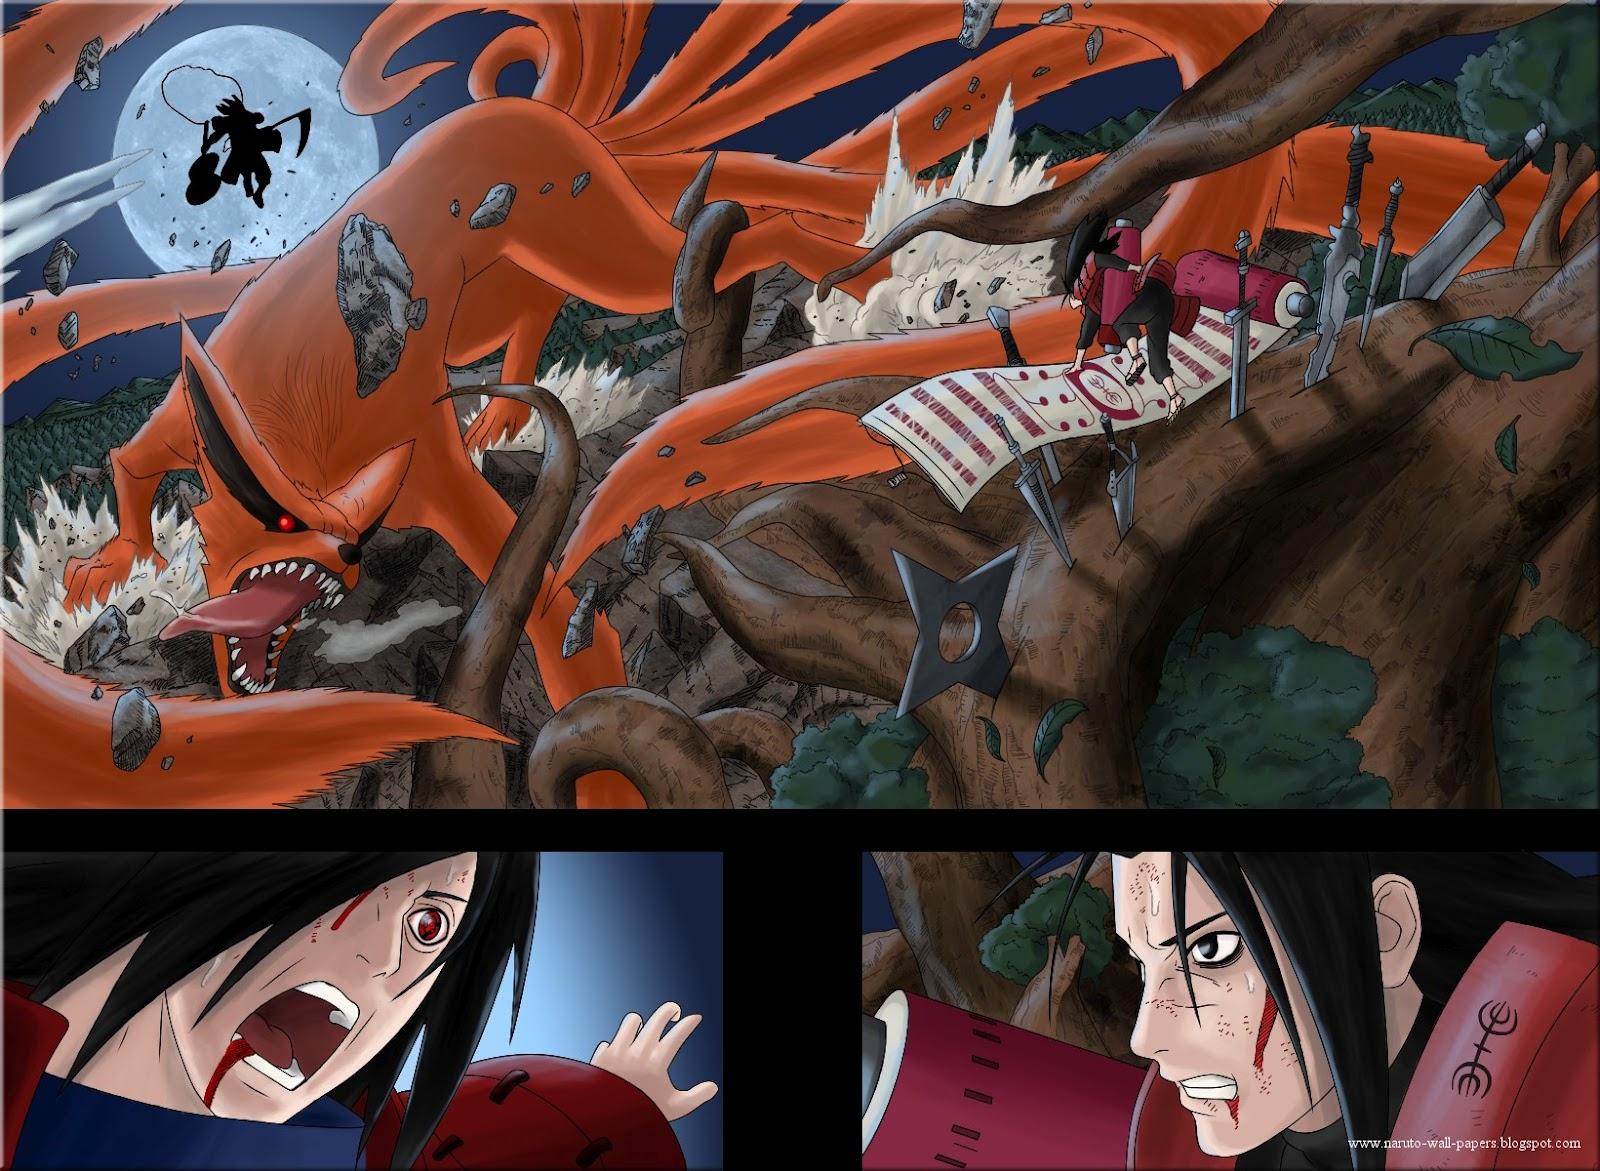 http://2.bp.blogspot.com/-vxoCV9NyImM/T8p5i8rukVI/AAAAAAAADz4/bWVwqvbXiwg/s1600/Uchiha_Madara_vs_Hashirama_Senju_wallpapers+%282%29.jpg